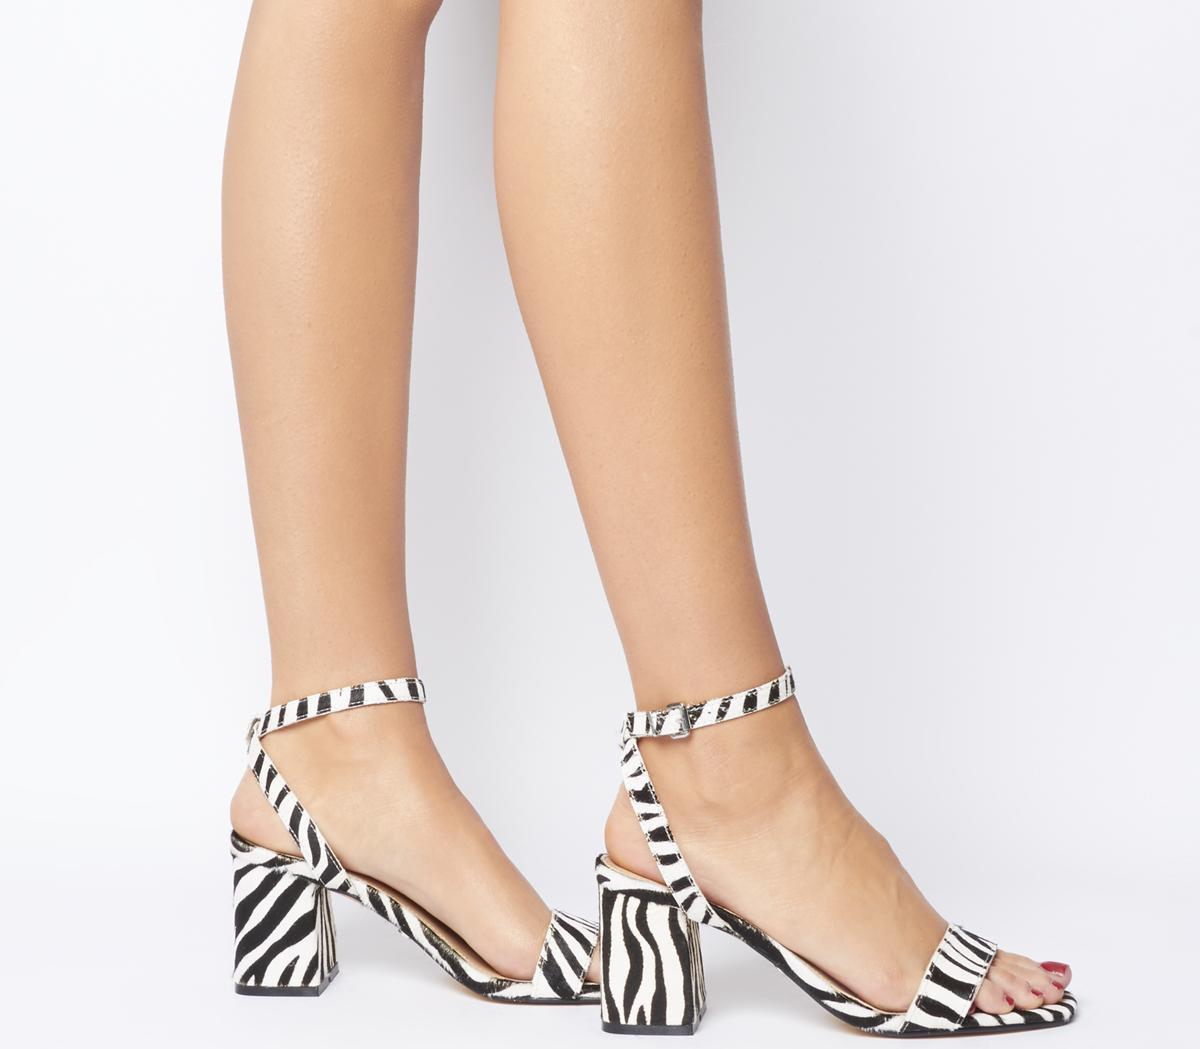 Millions Square Toe Sandals